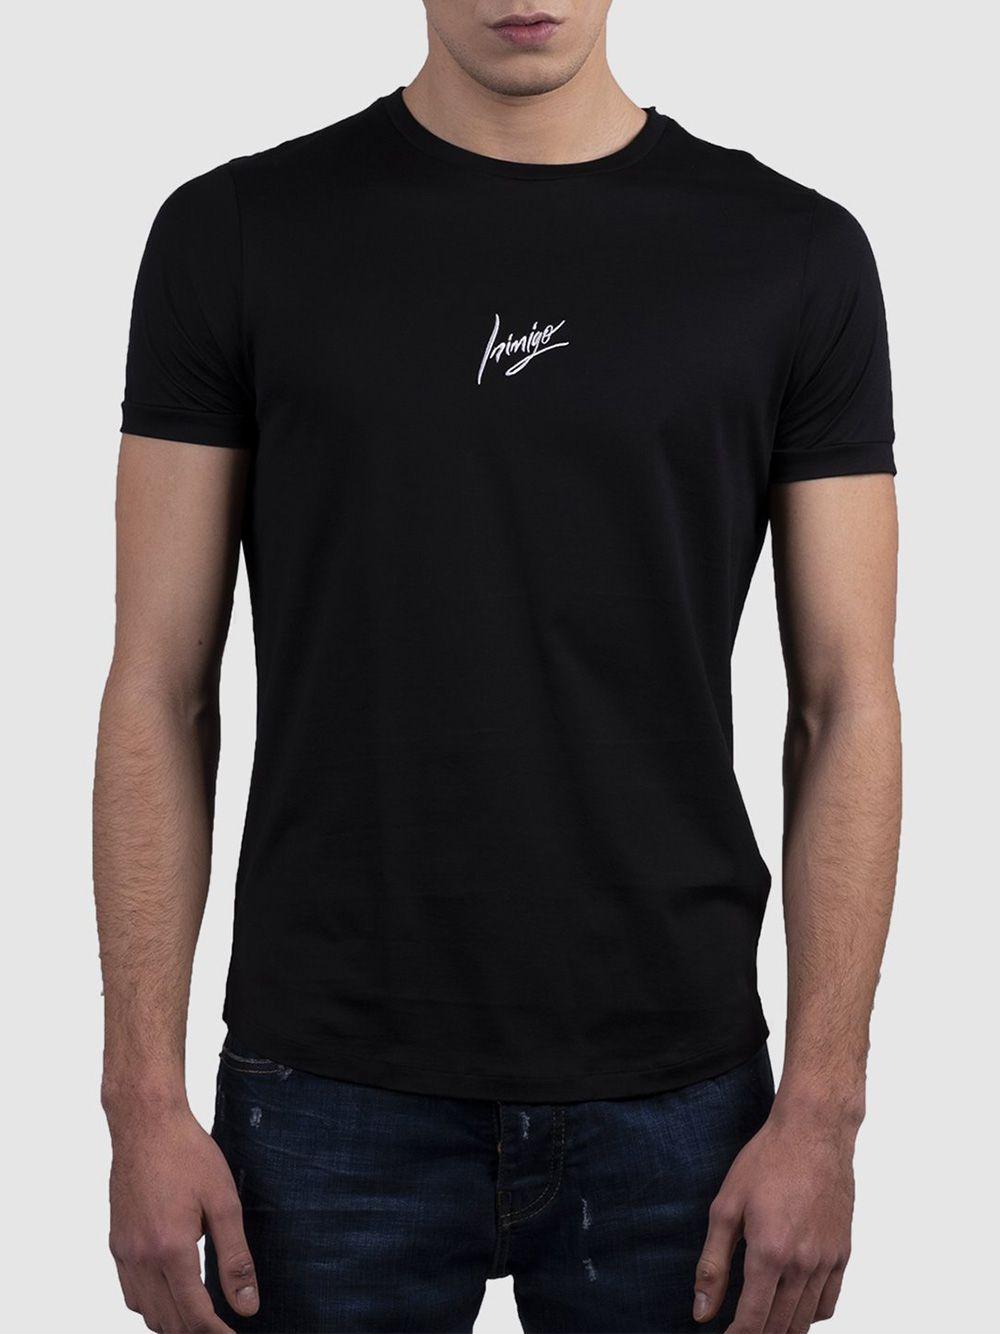 T-shirt Preto Rockstar